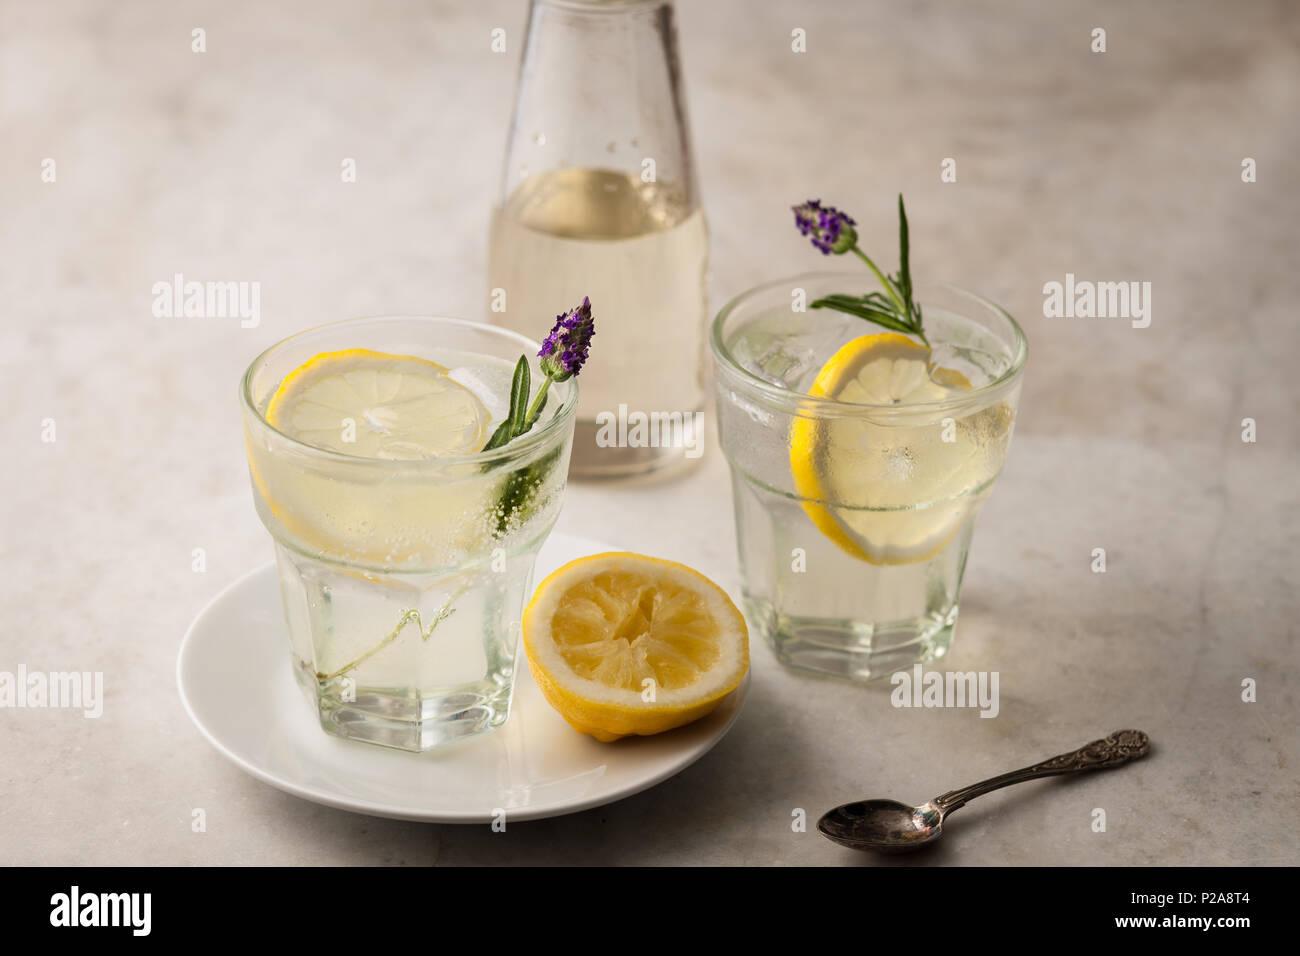 Citrus lemonade with lemon slices and lavender - Stock Image